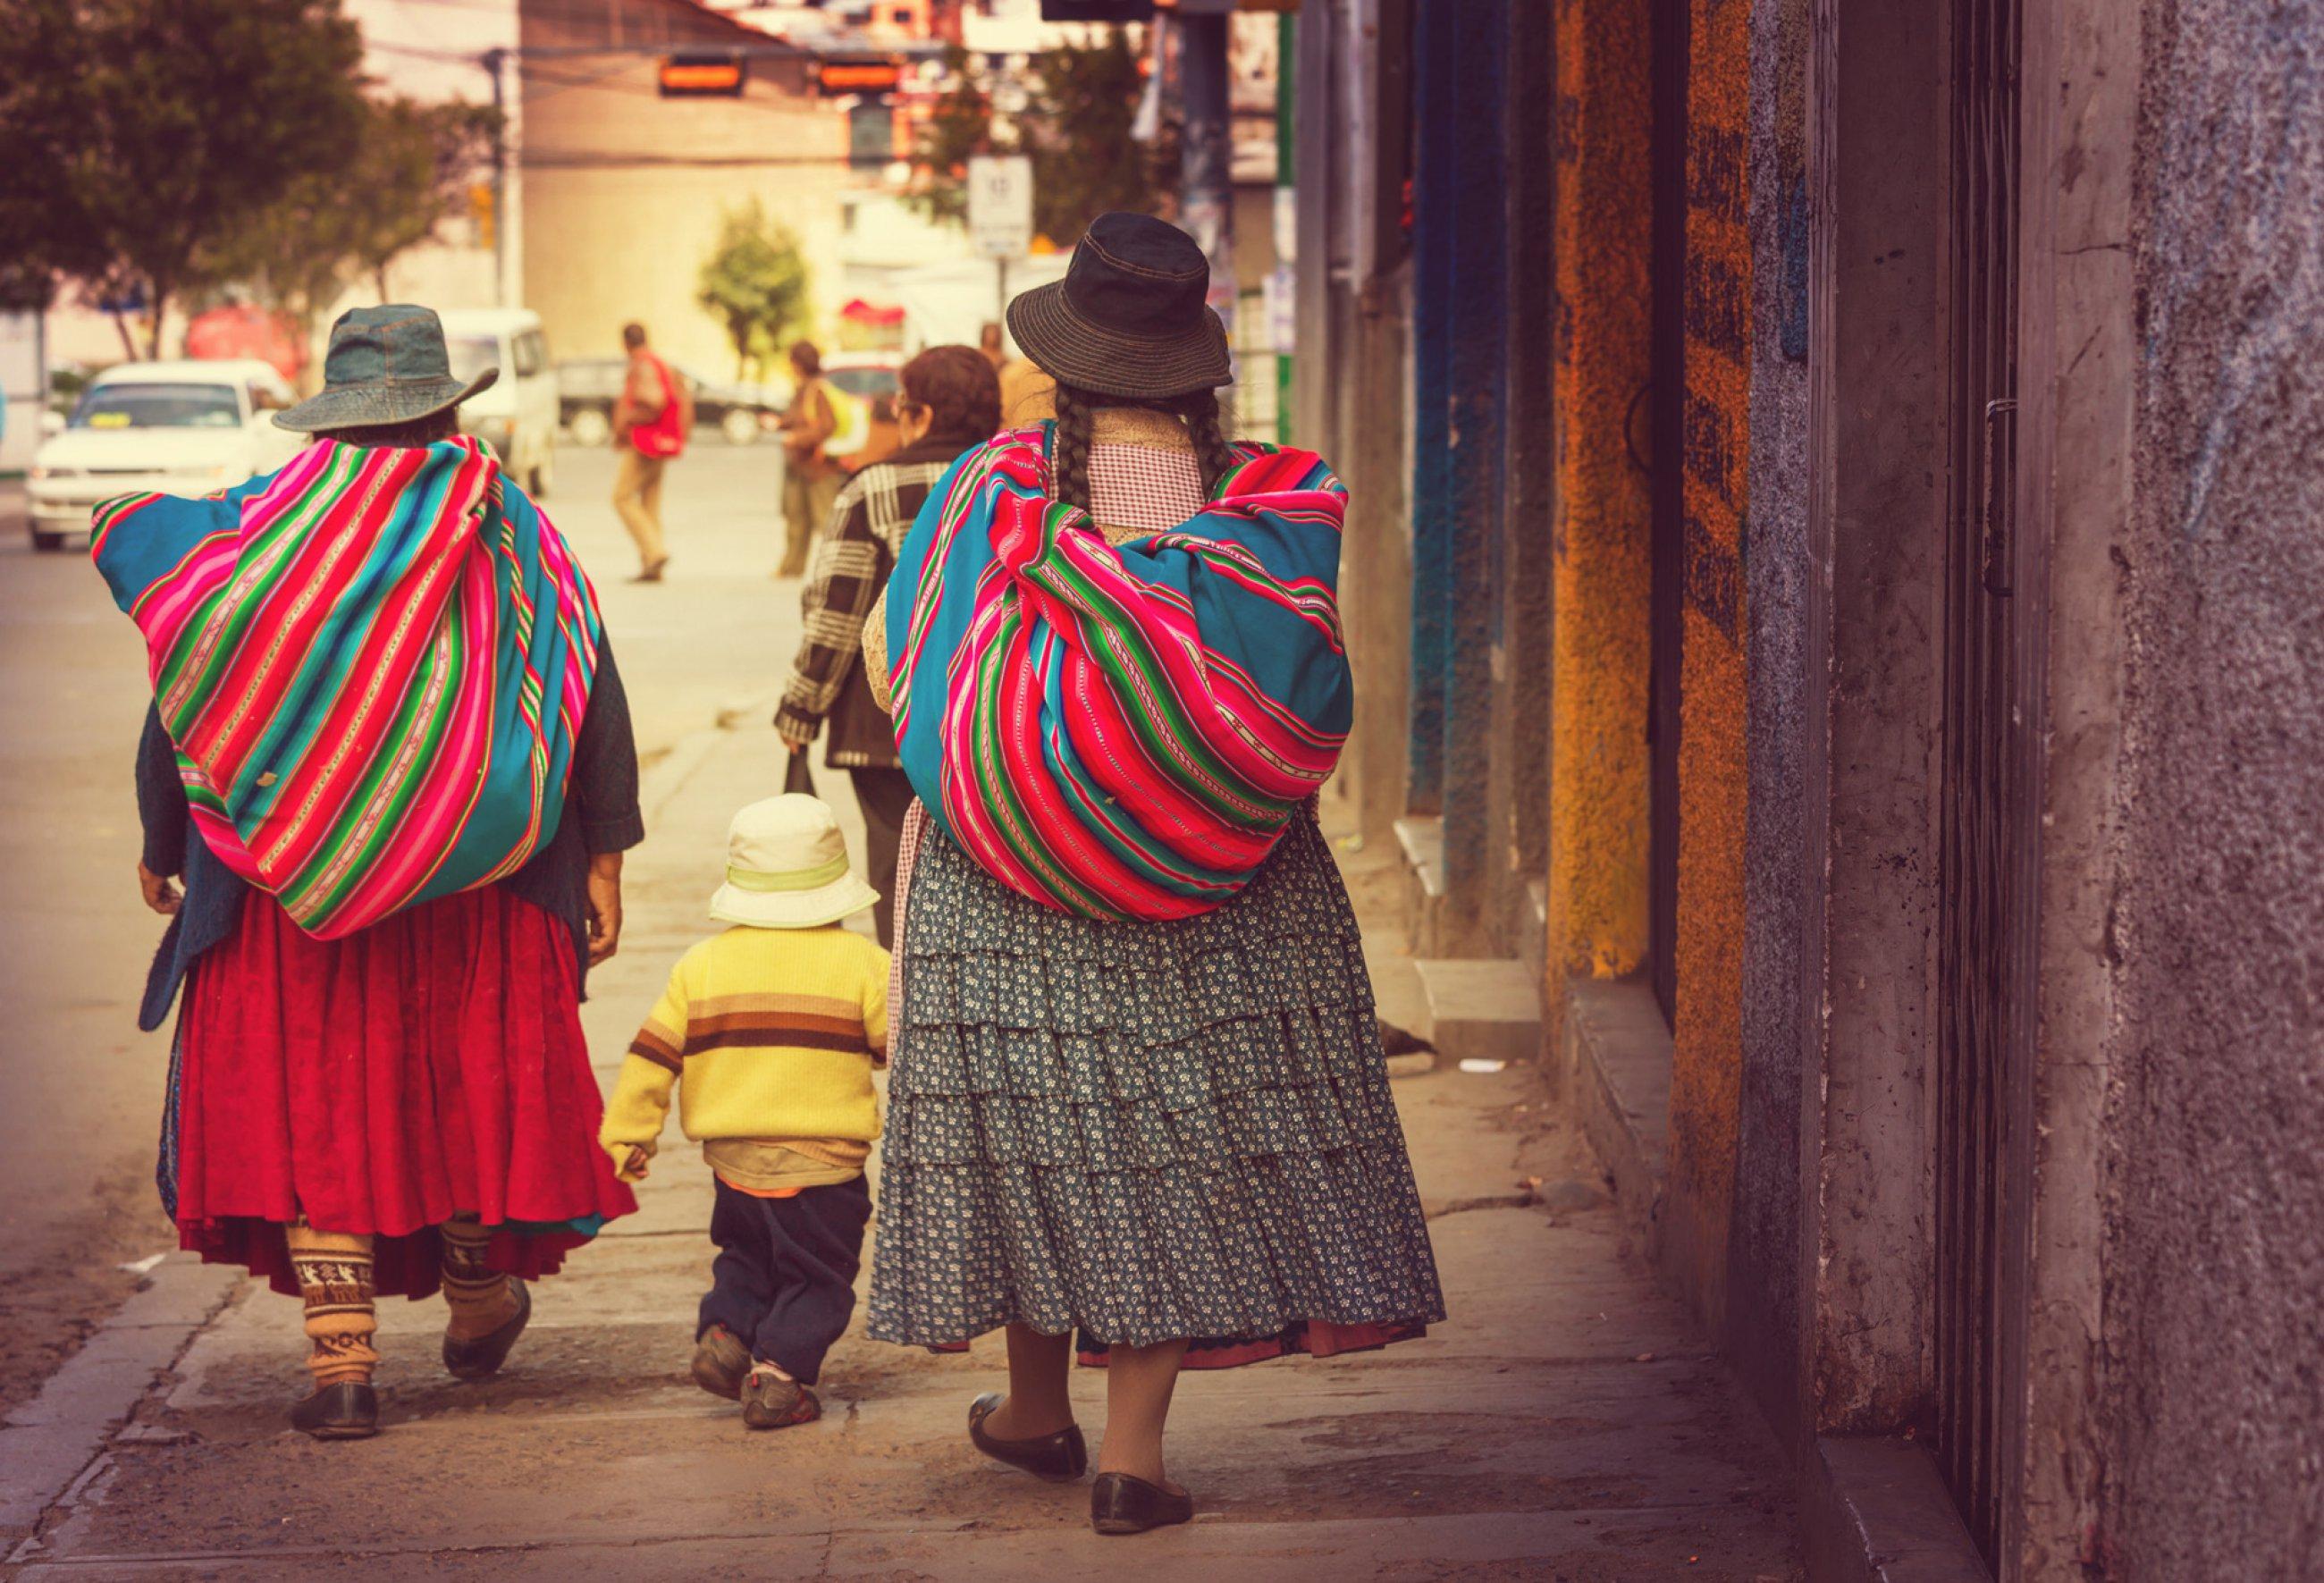 https://bubo.sk/uploads/galleries/5014/bolivia-la-paz-shutterstock-233802457-1-.jpg